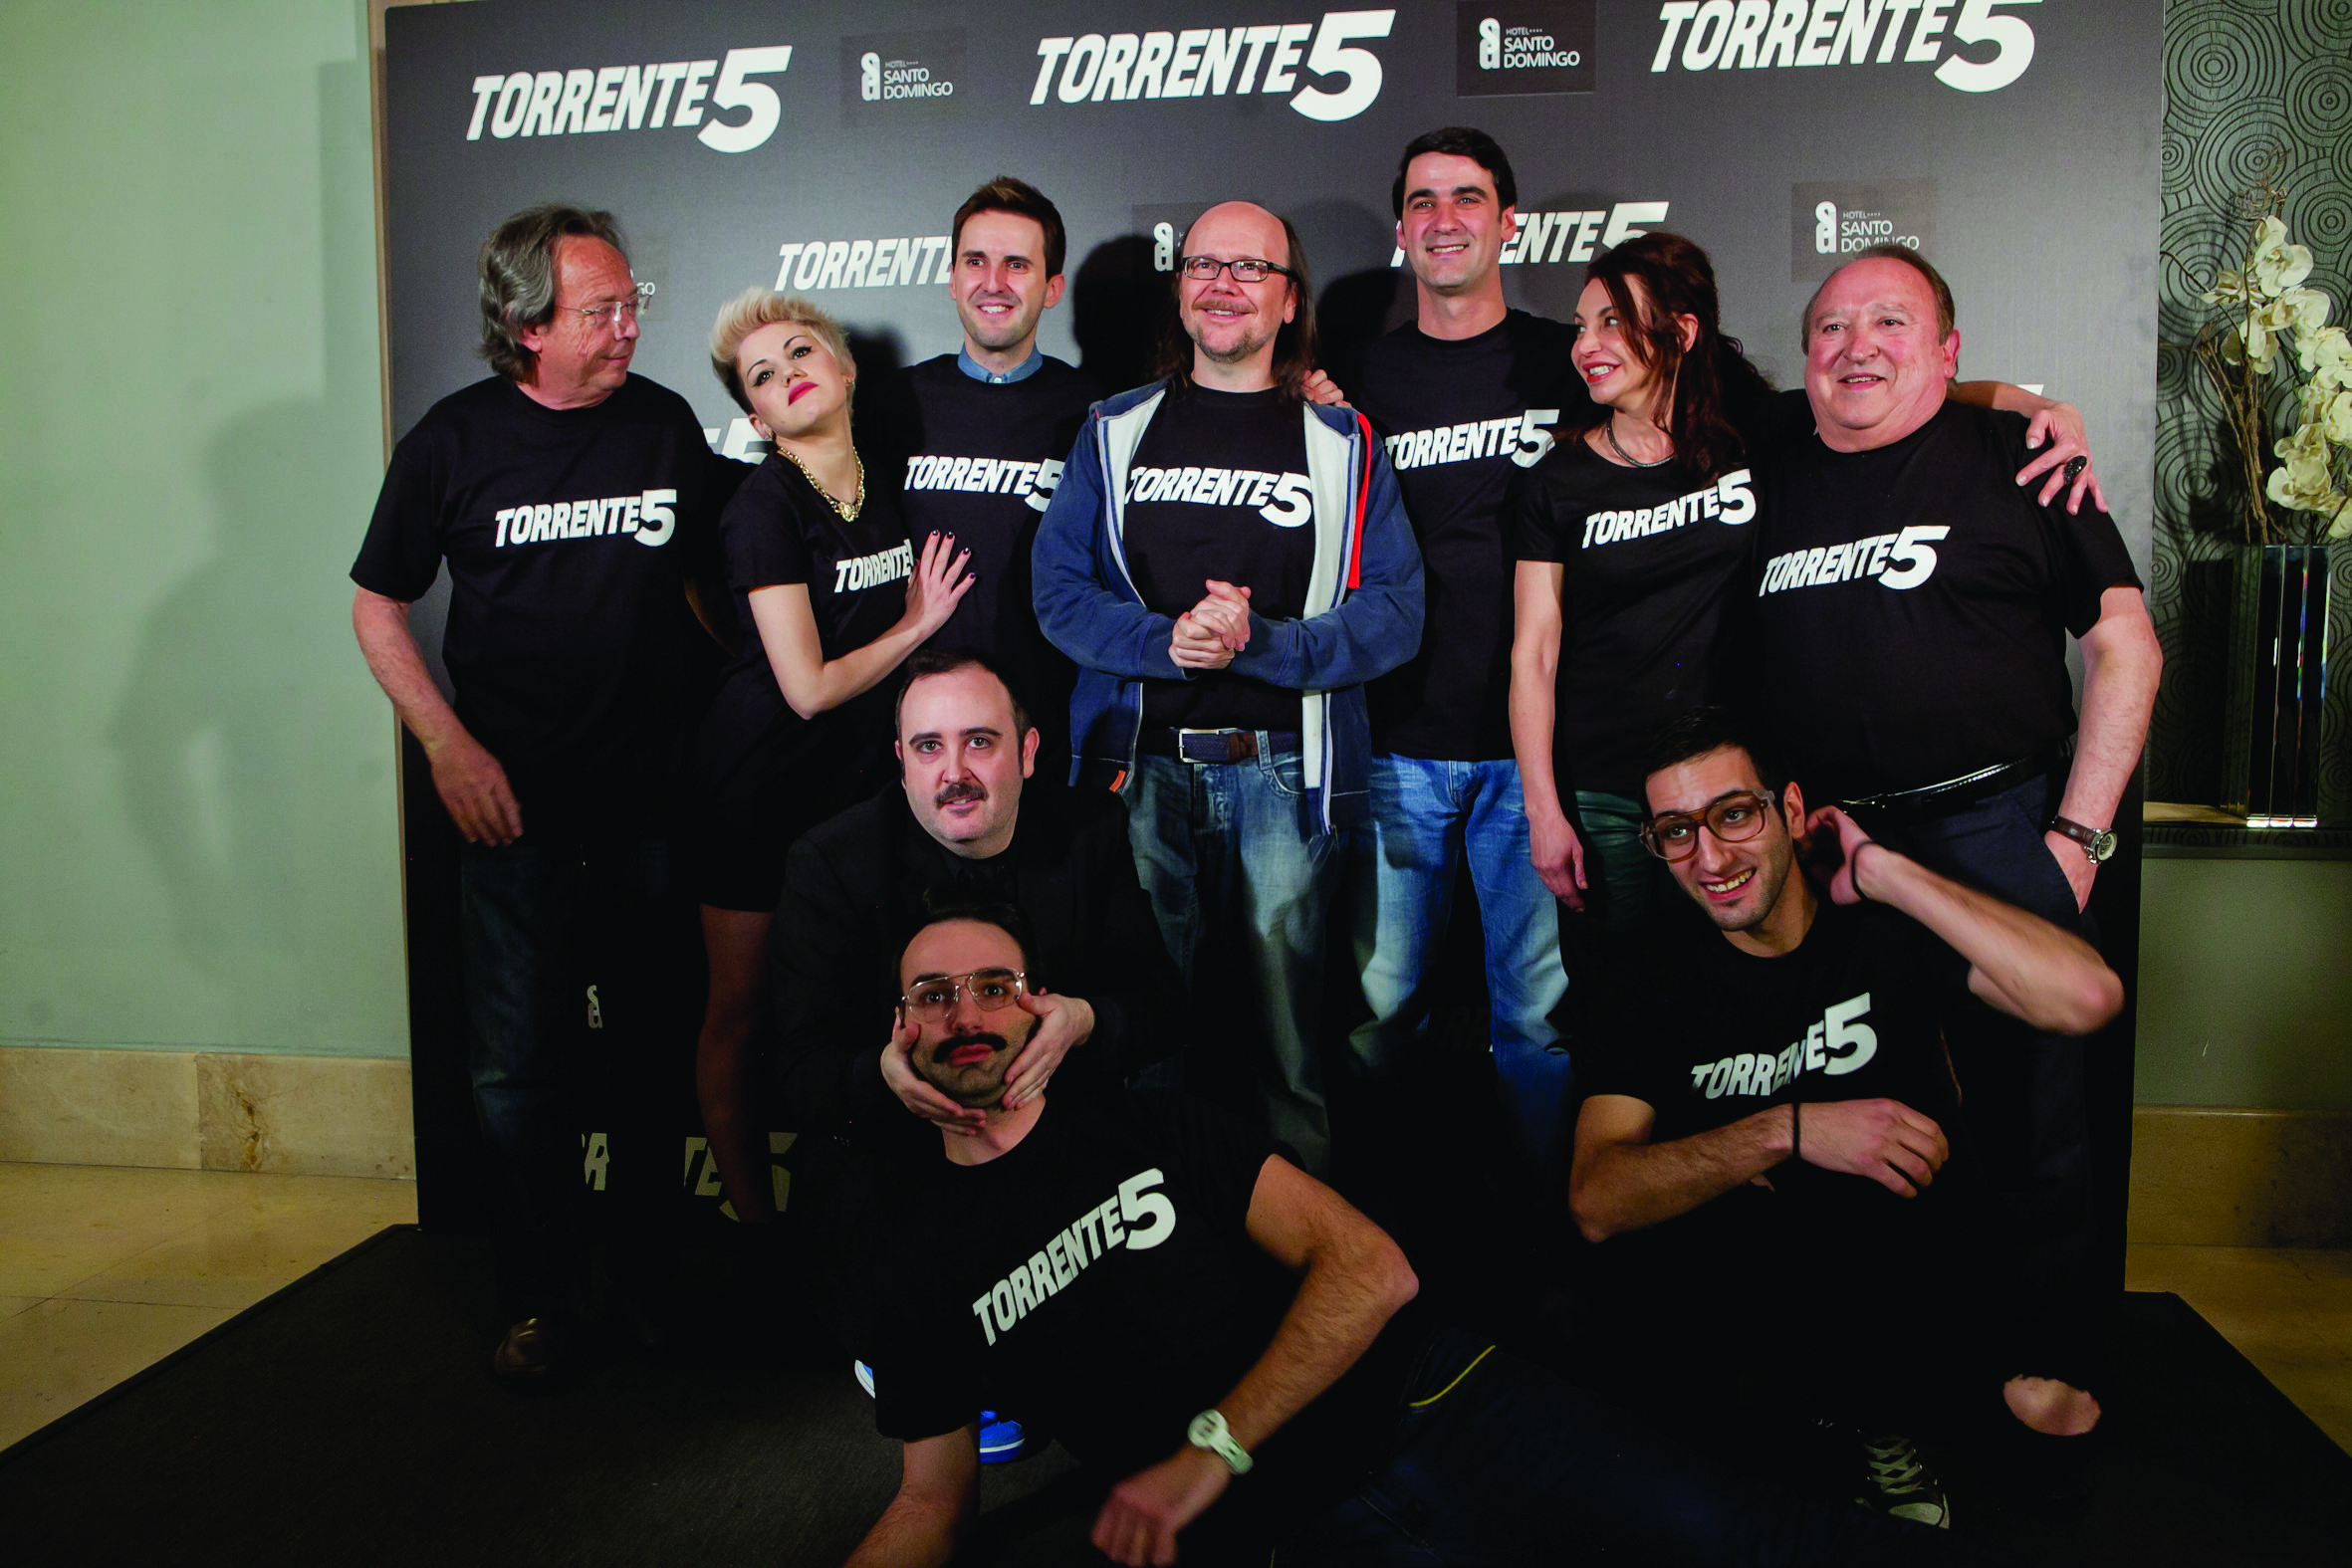 Torrente 5 Multiplayers